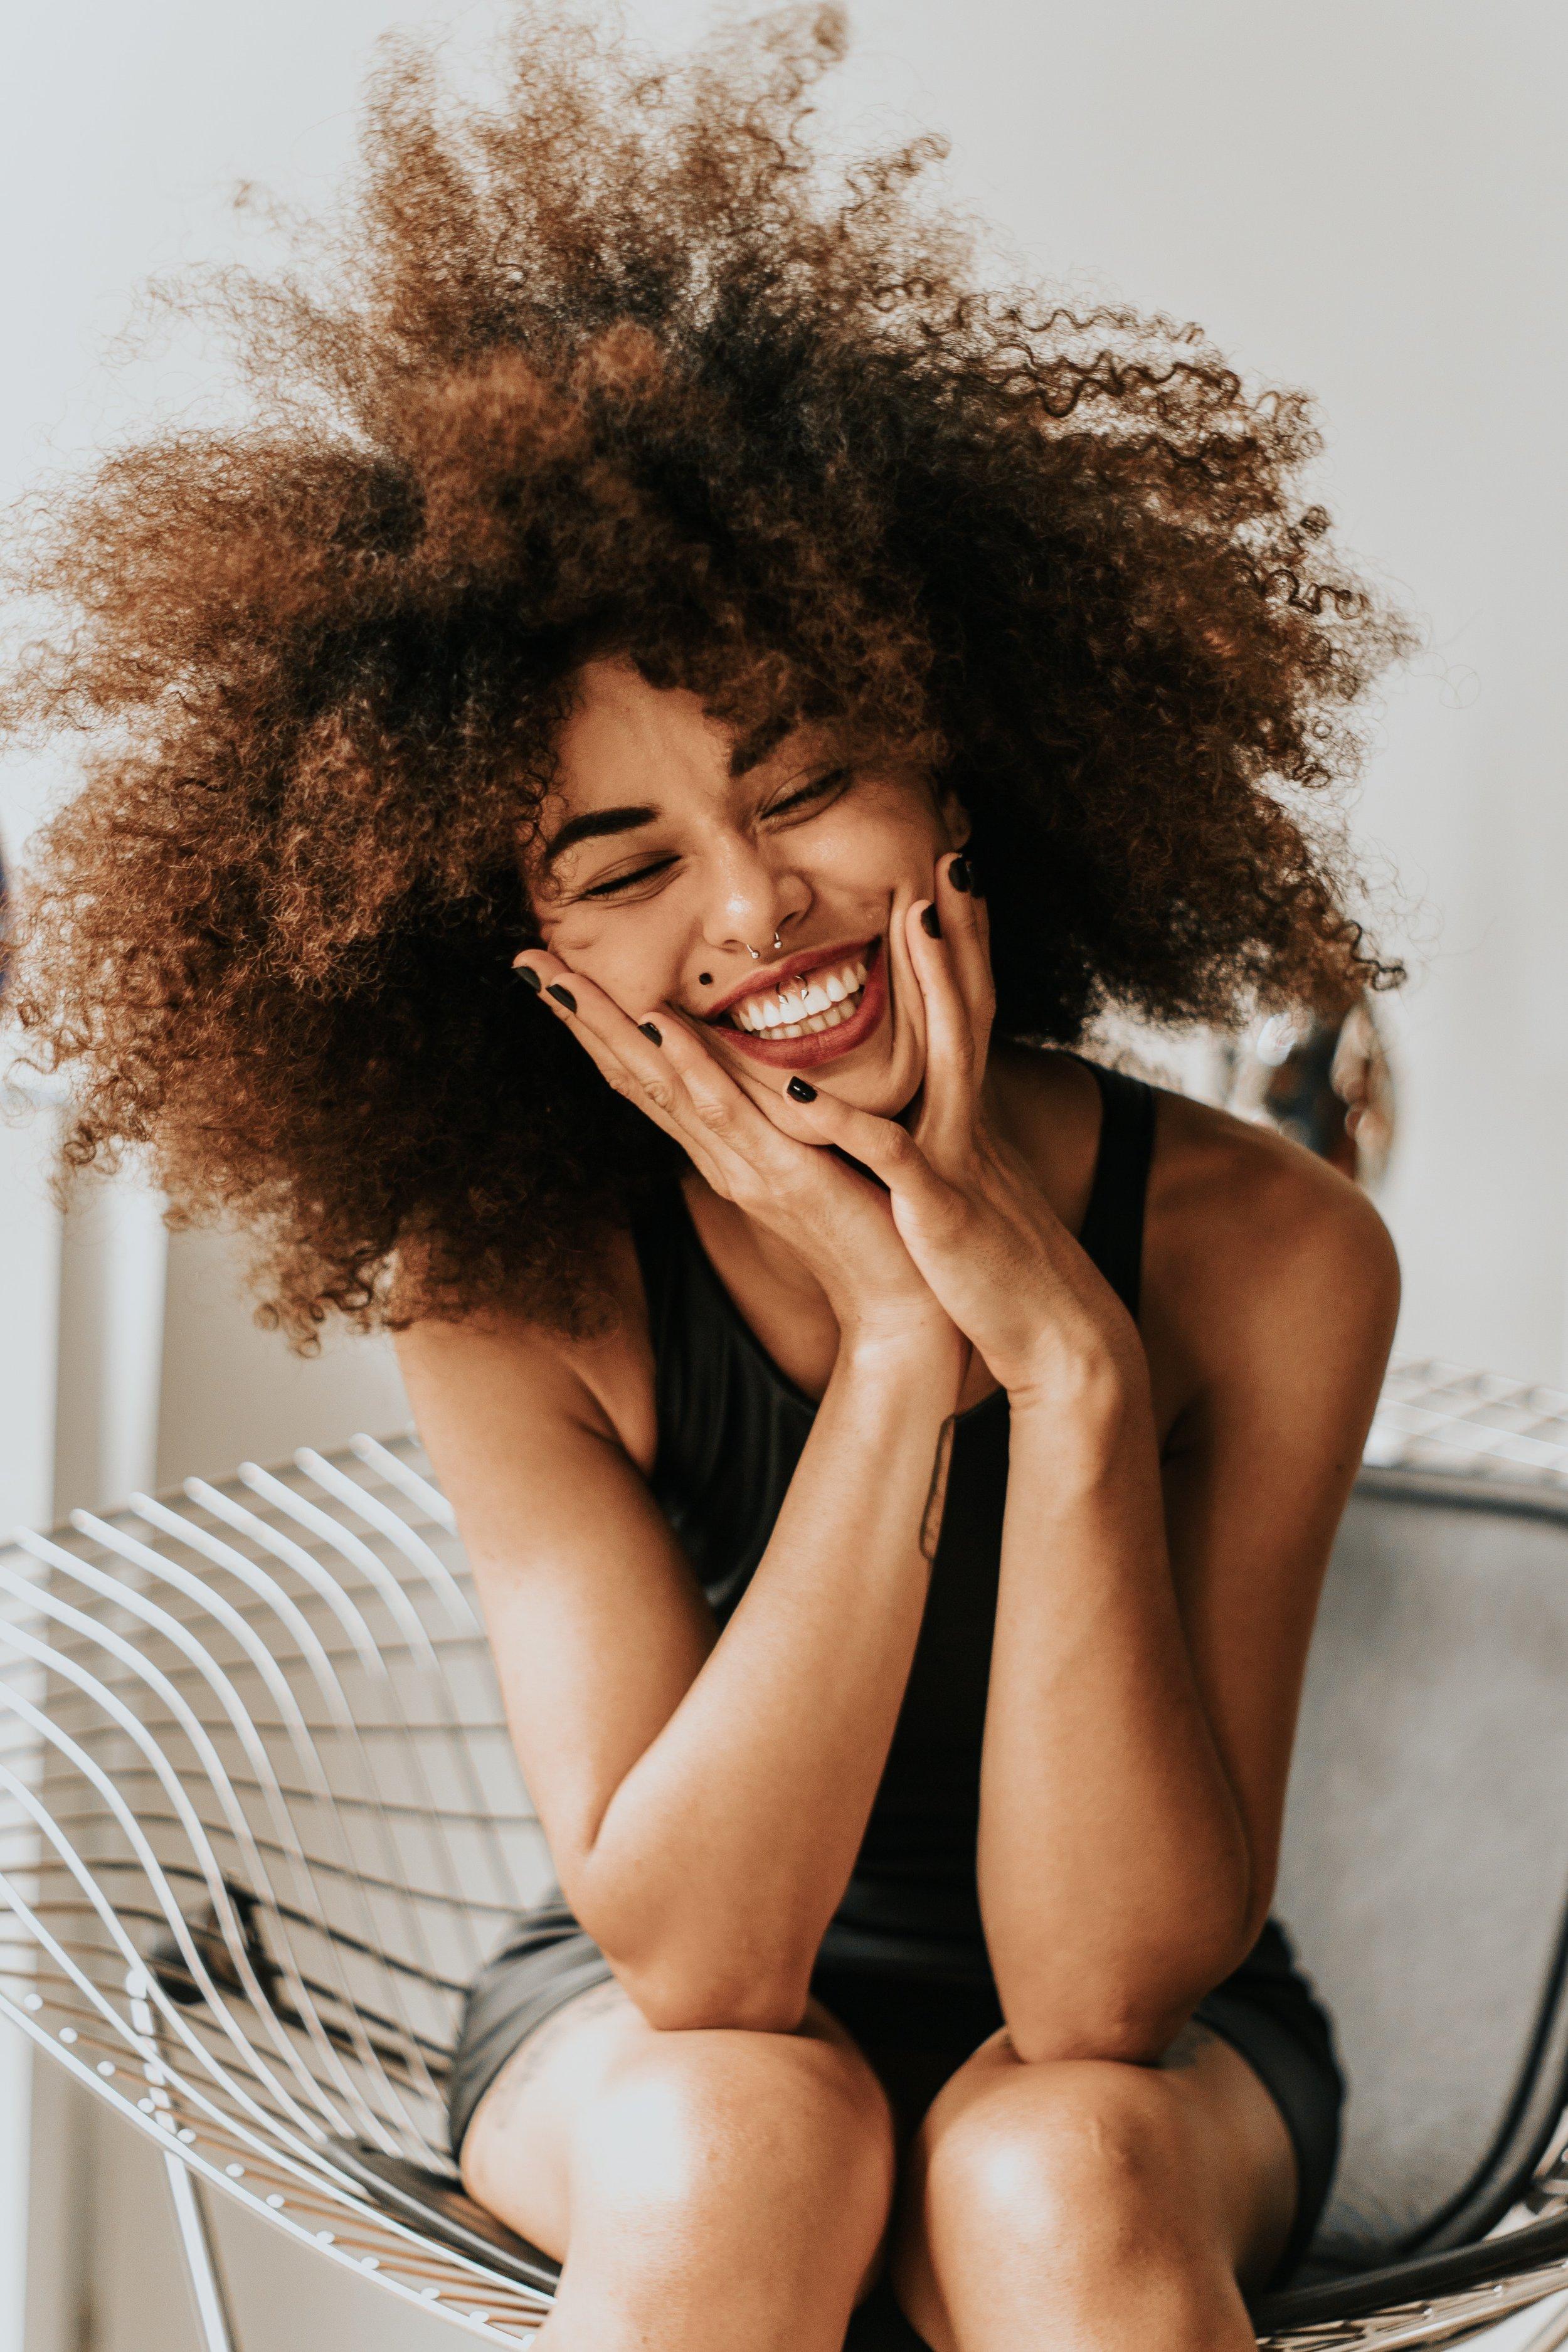 adult-afro-beautiful-1858175.jpg